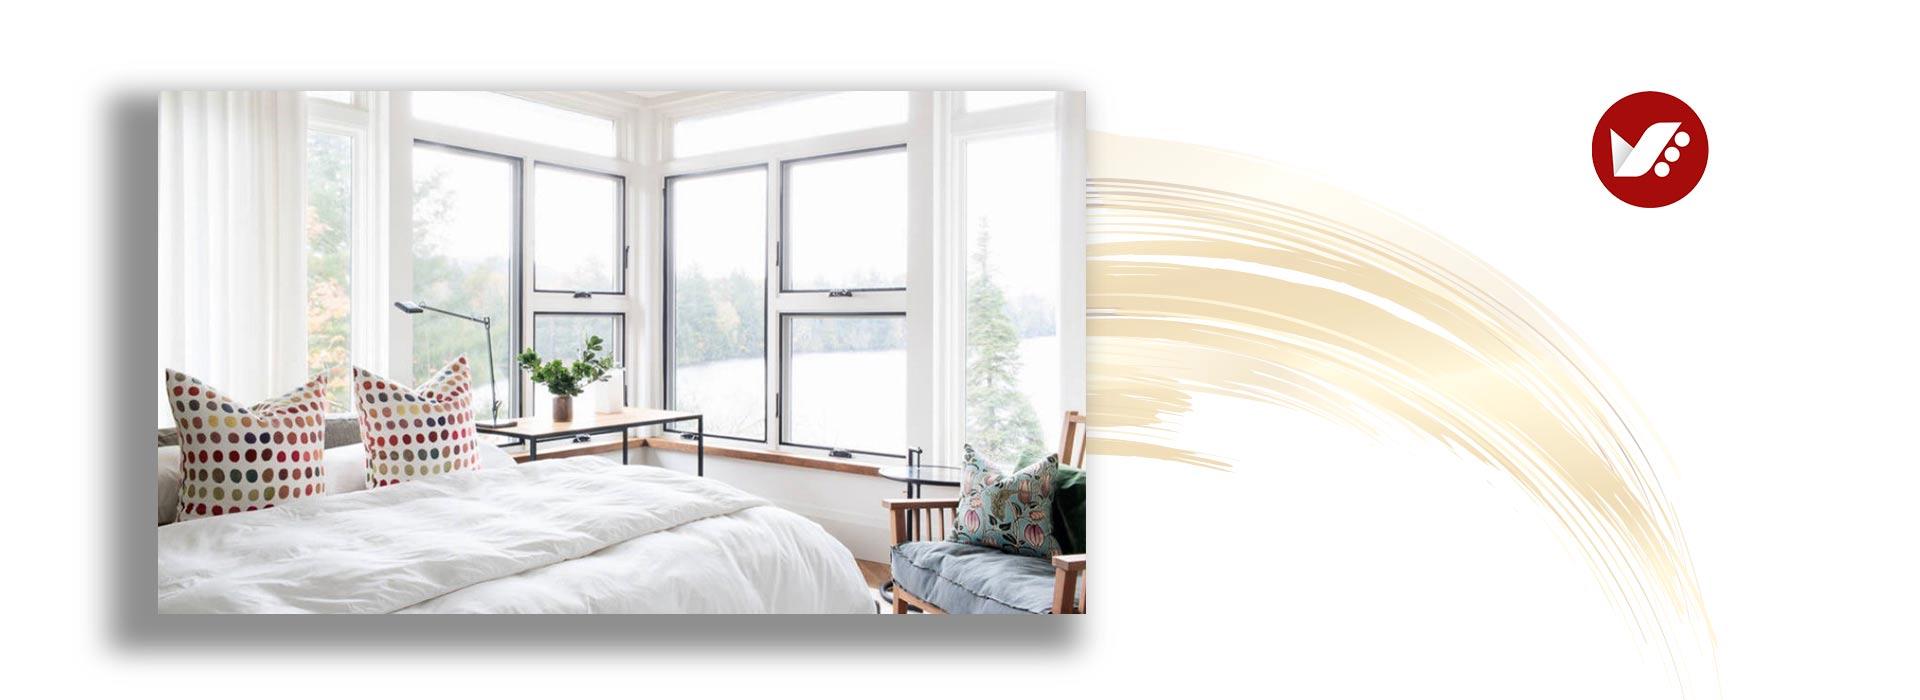 bedroom makeover private spacejpg - تغییر دکوراسیون اتاق خواب